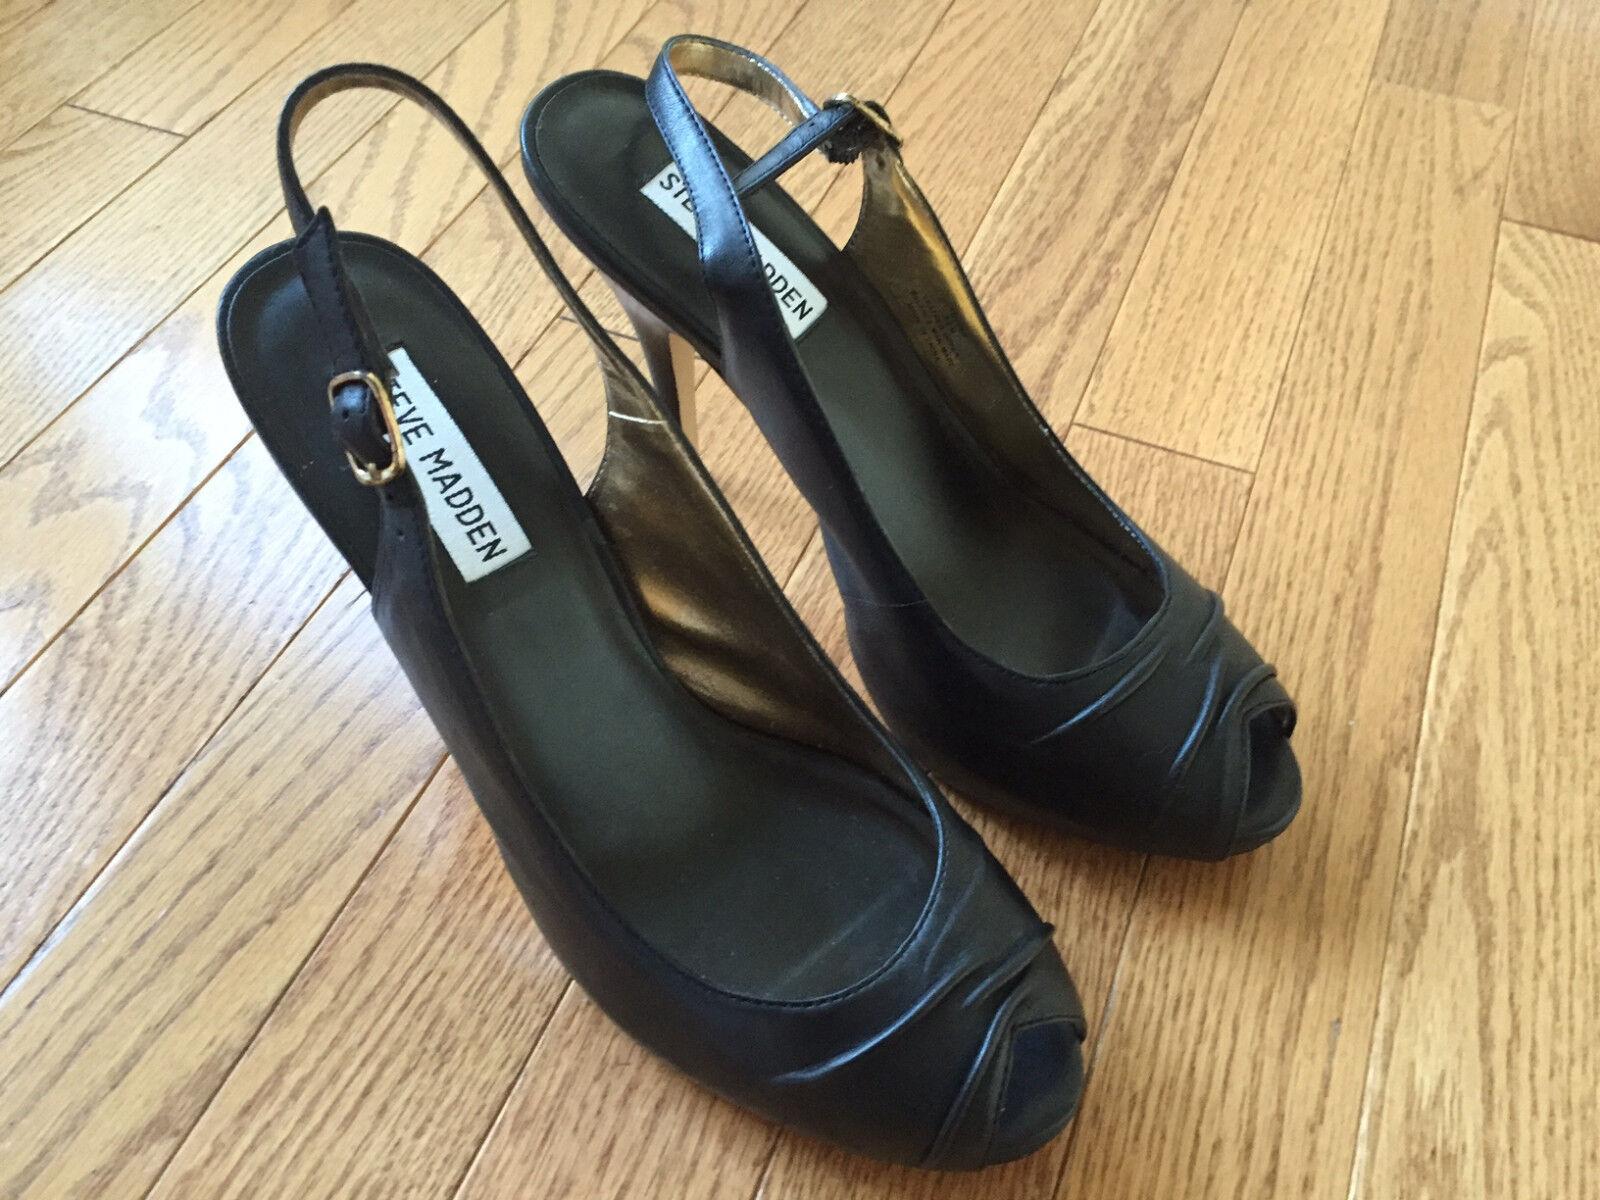 Steve Madden Fevver Black Leather Slingback Peep-toe Pumps 8.5